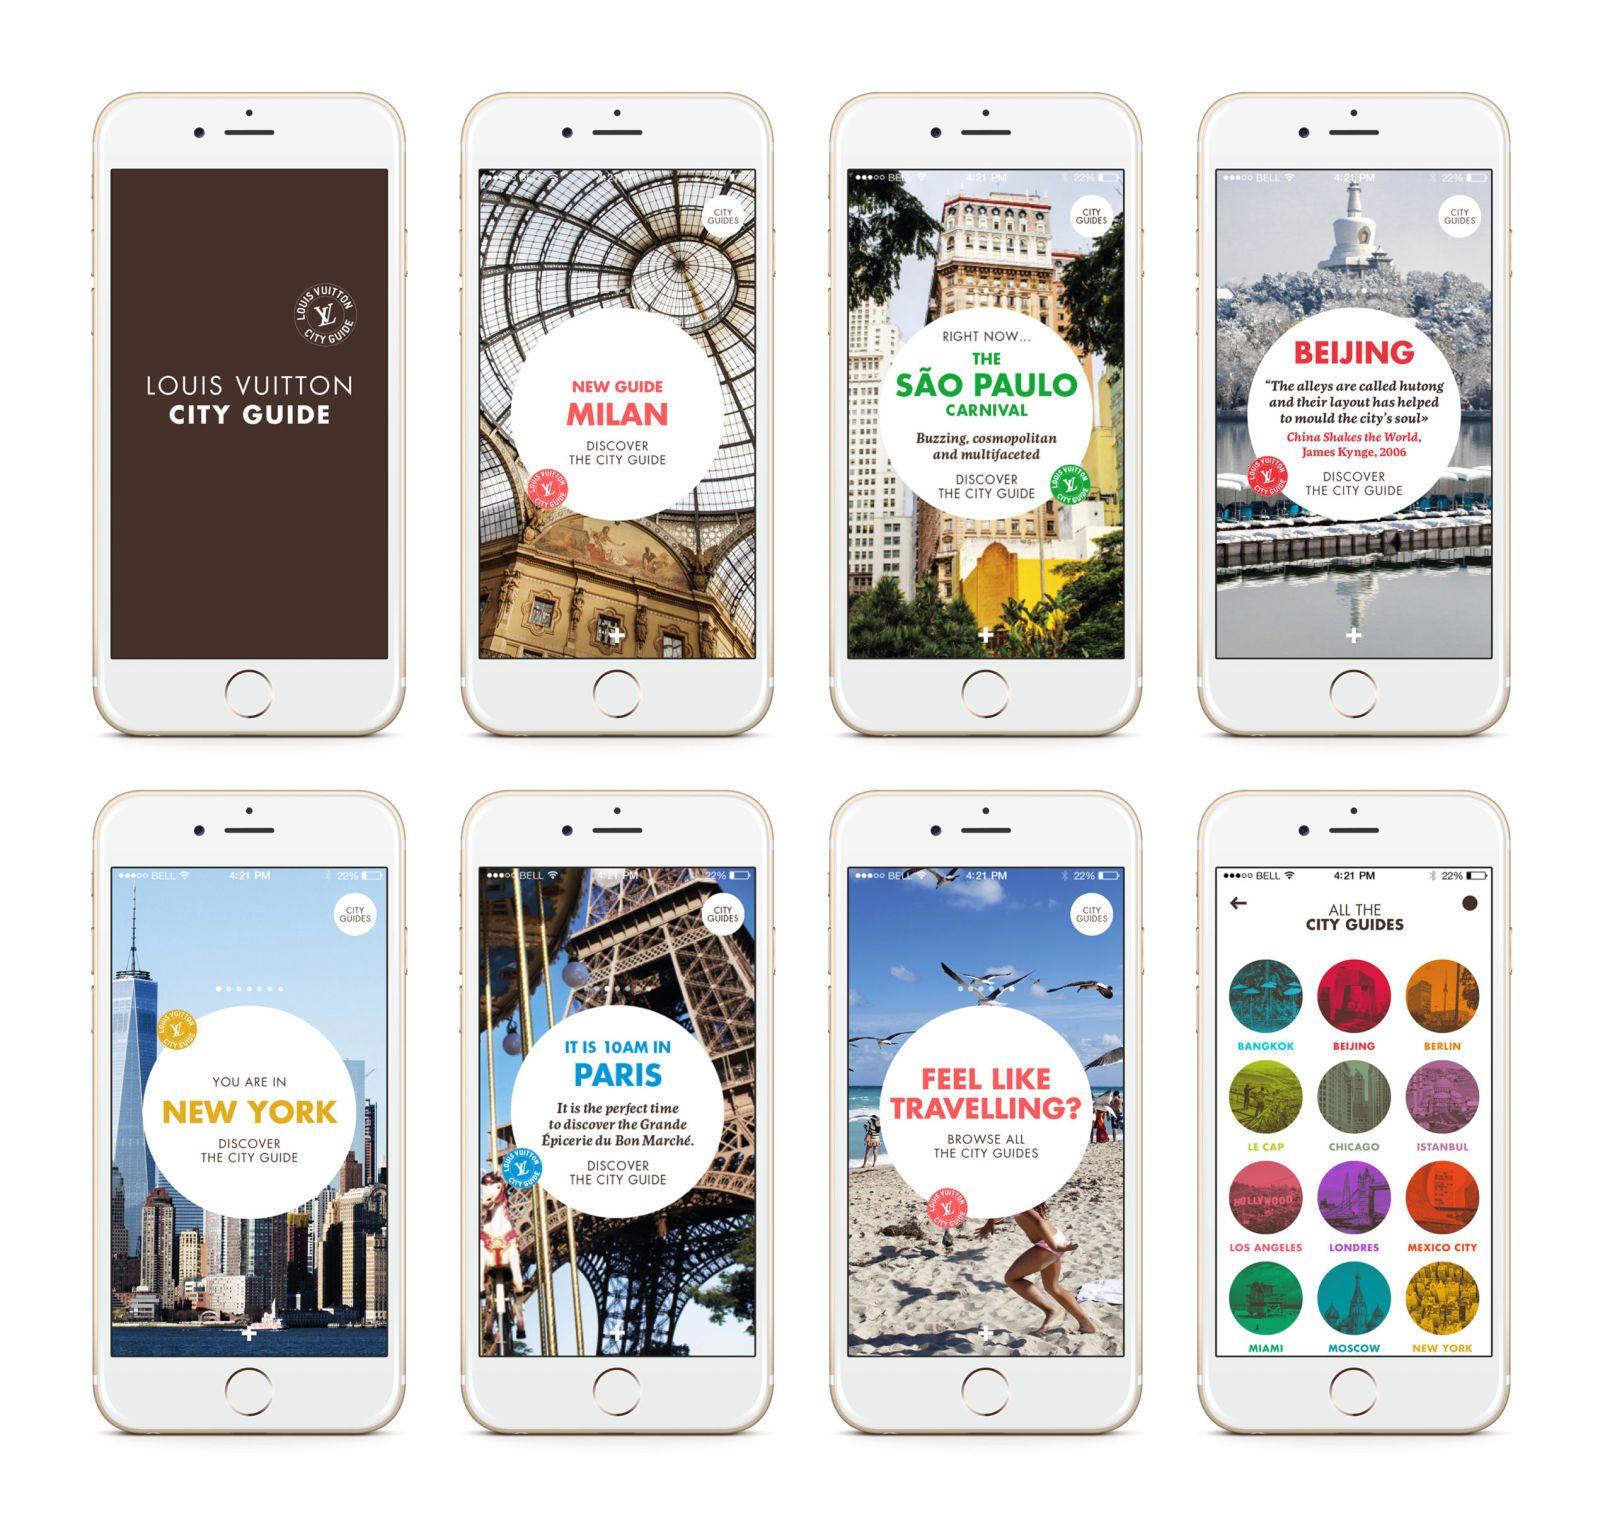 Louis Vuitton Launches City Guide Apps - HarpersBAZAAR.com